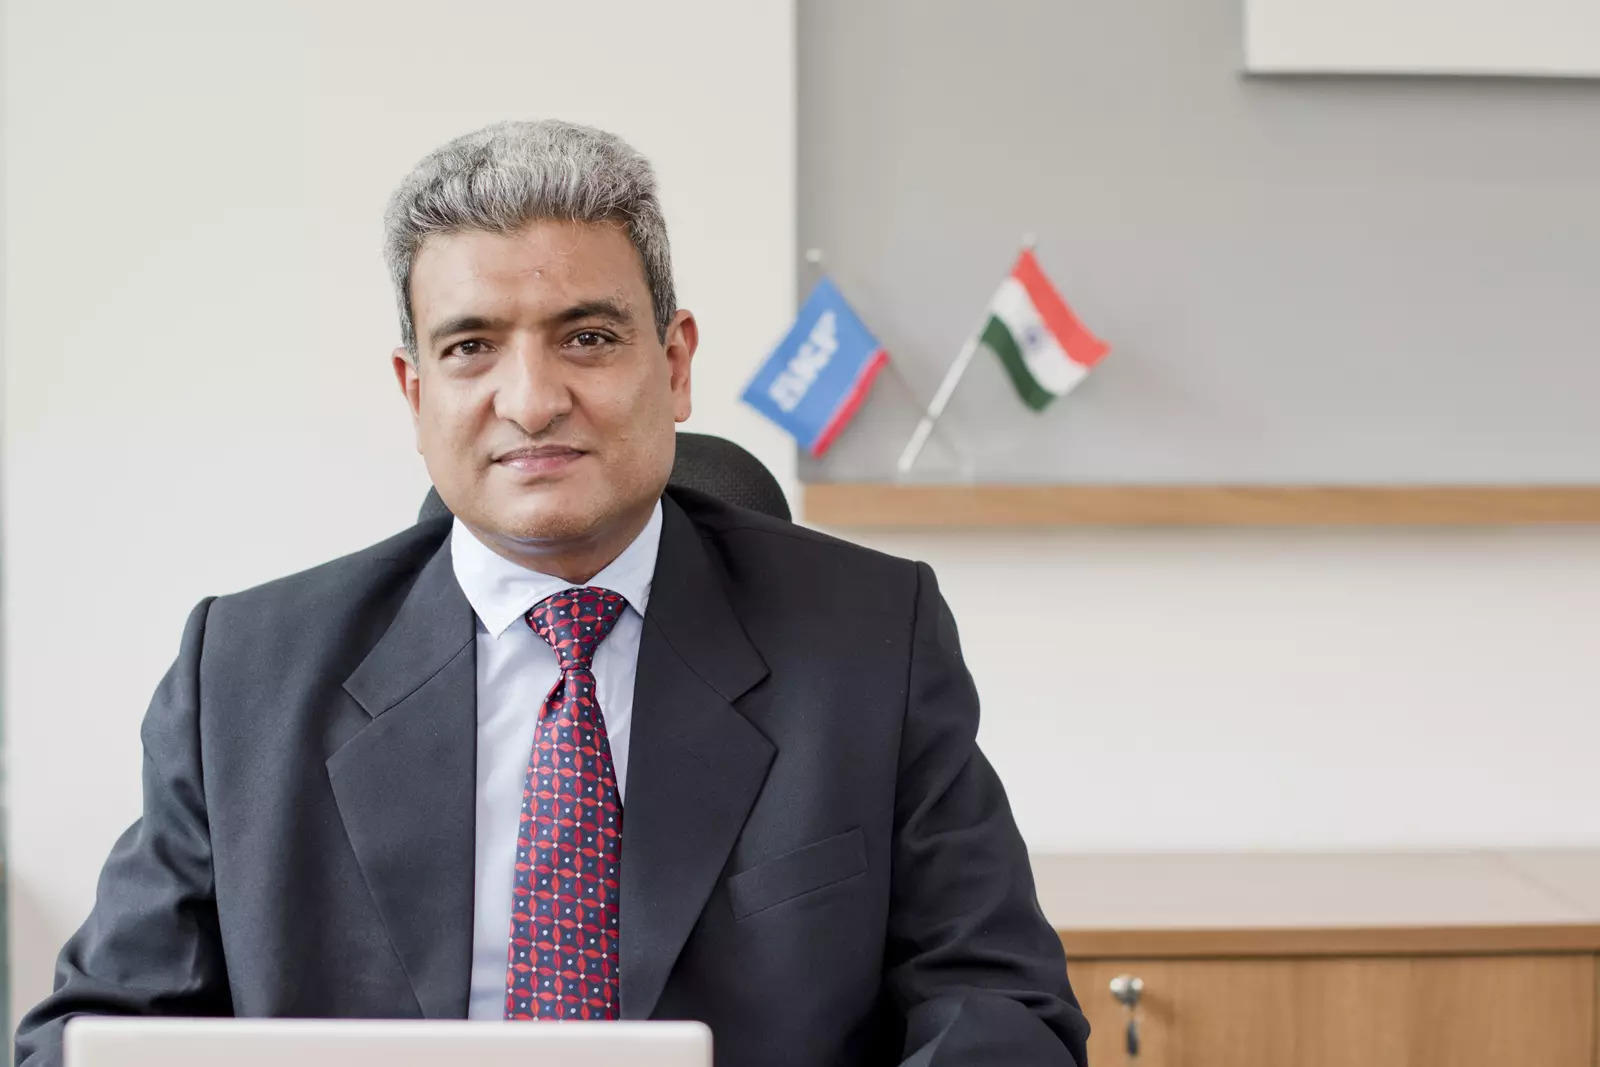 S. Venkat Subramaniam, Director, SKF